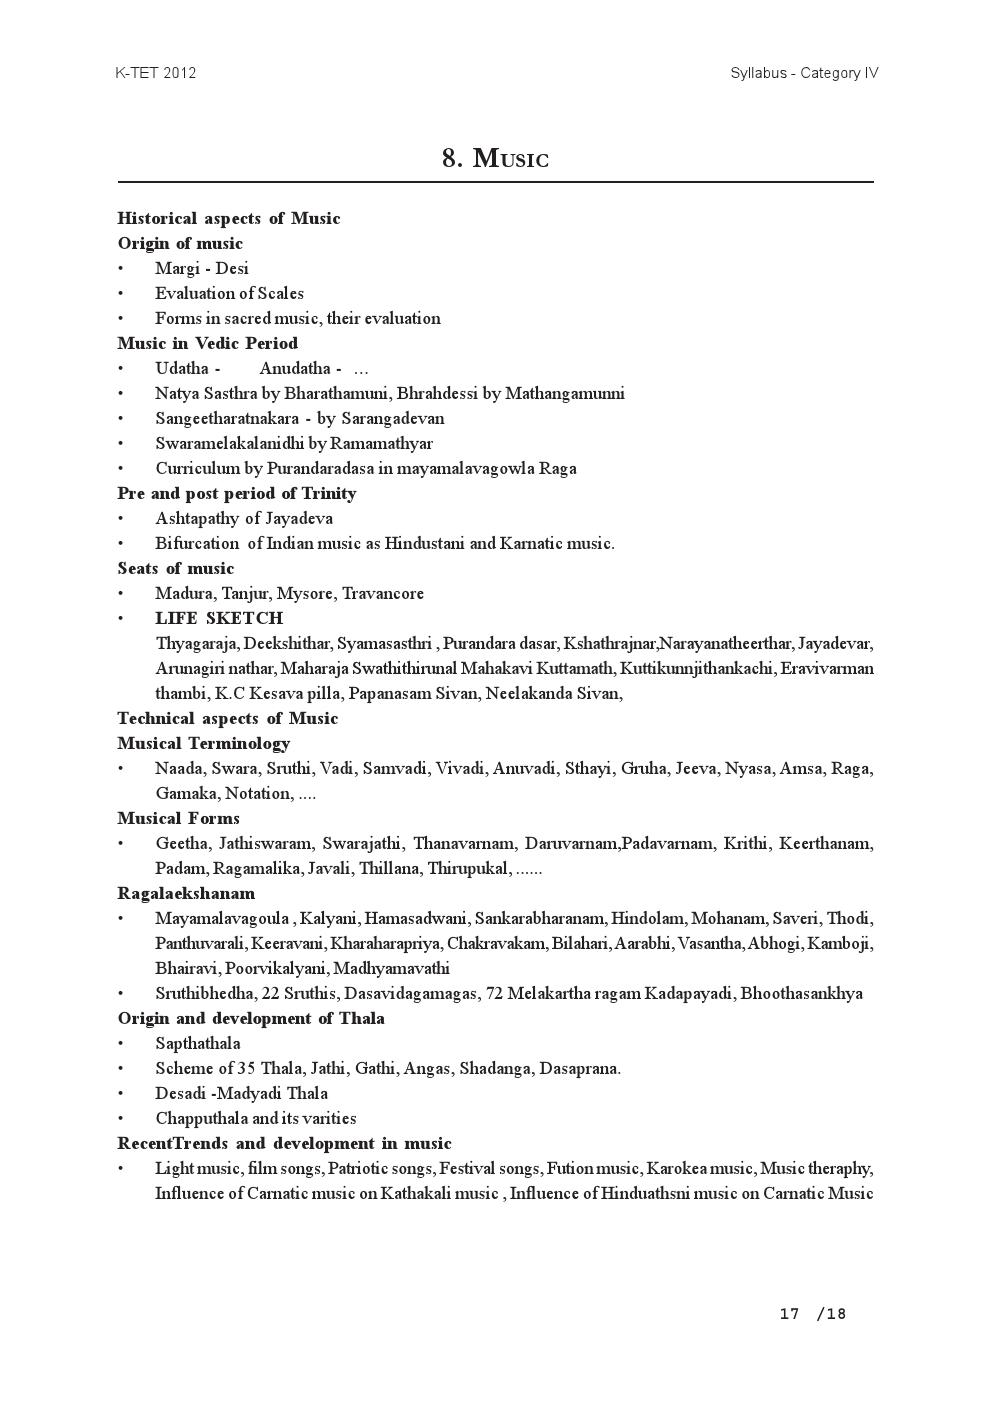 http://masterstudy.net/pdf/syllabus40017.jpg